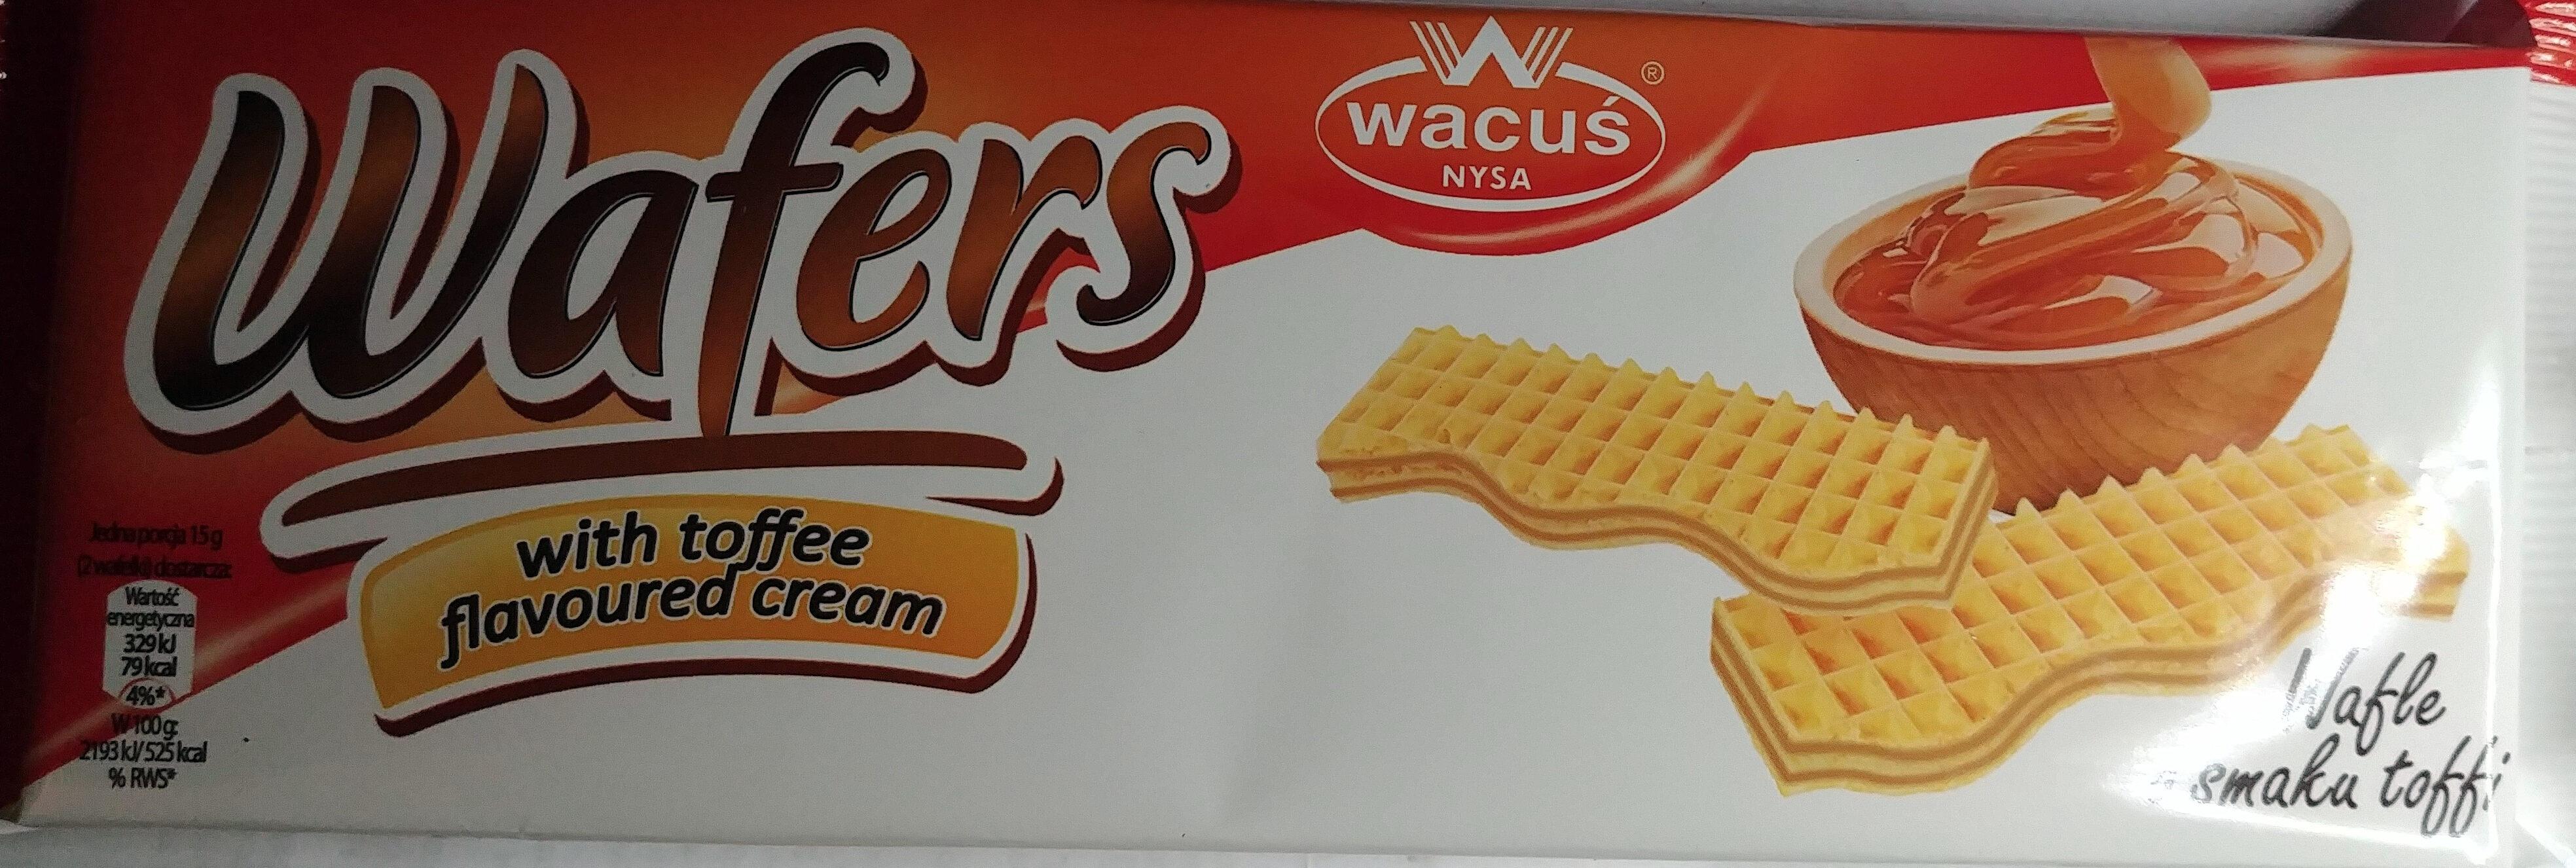 Wafle o smaku toffi - Produkt